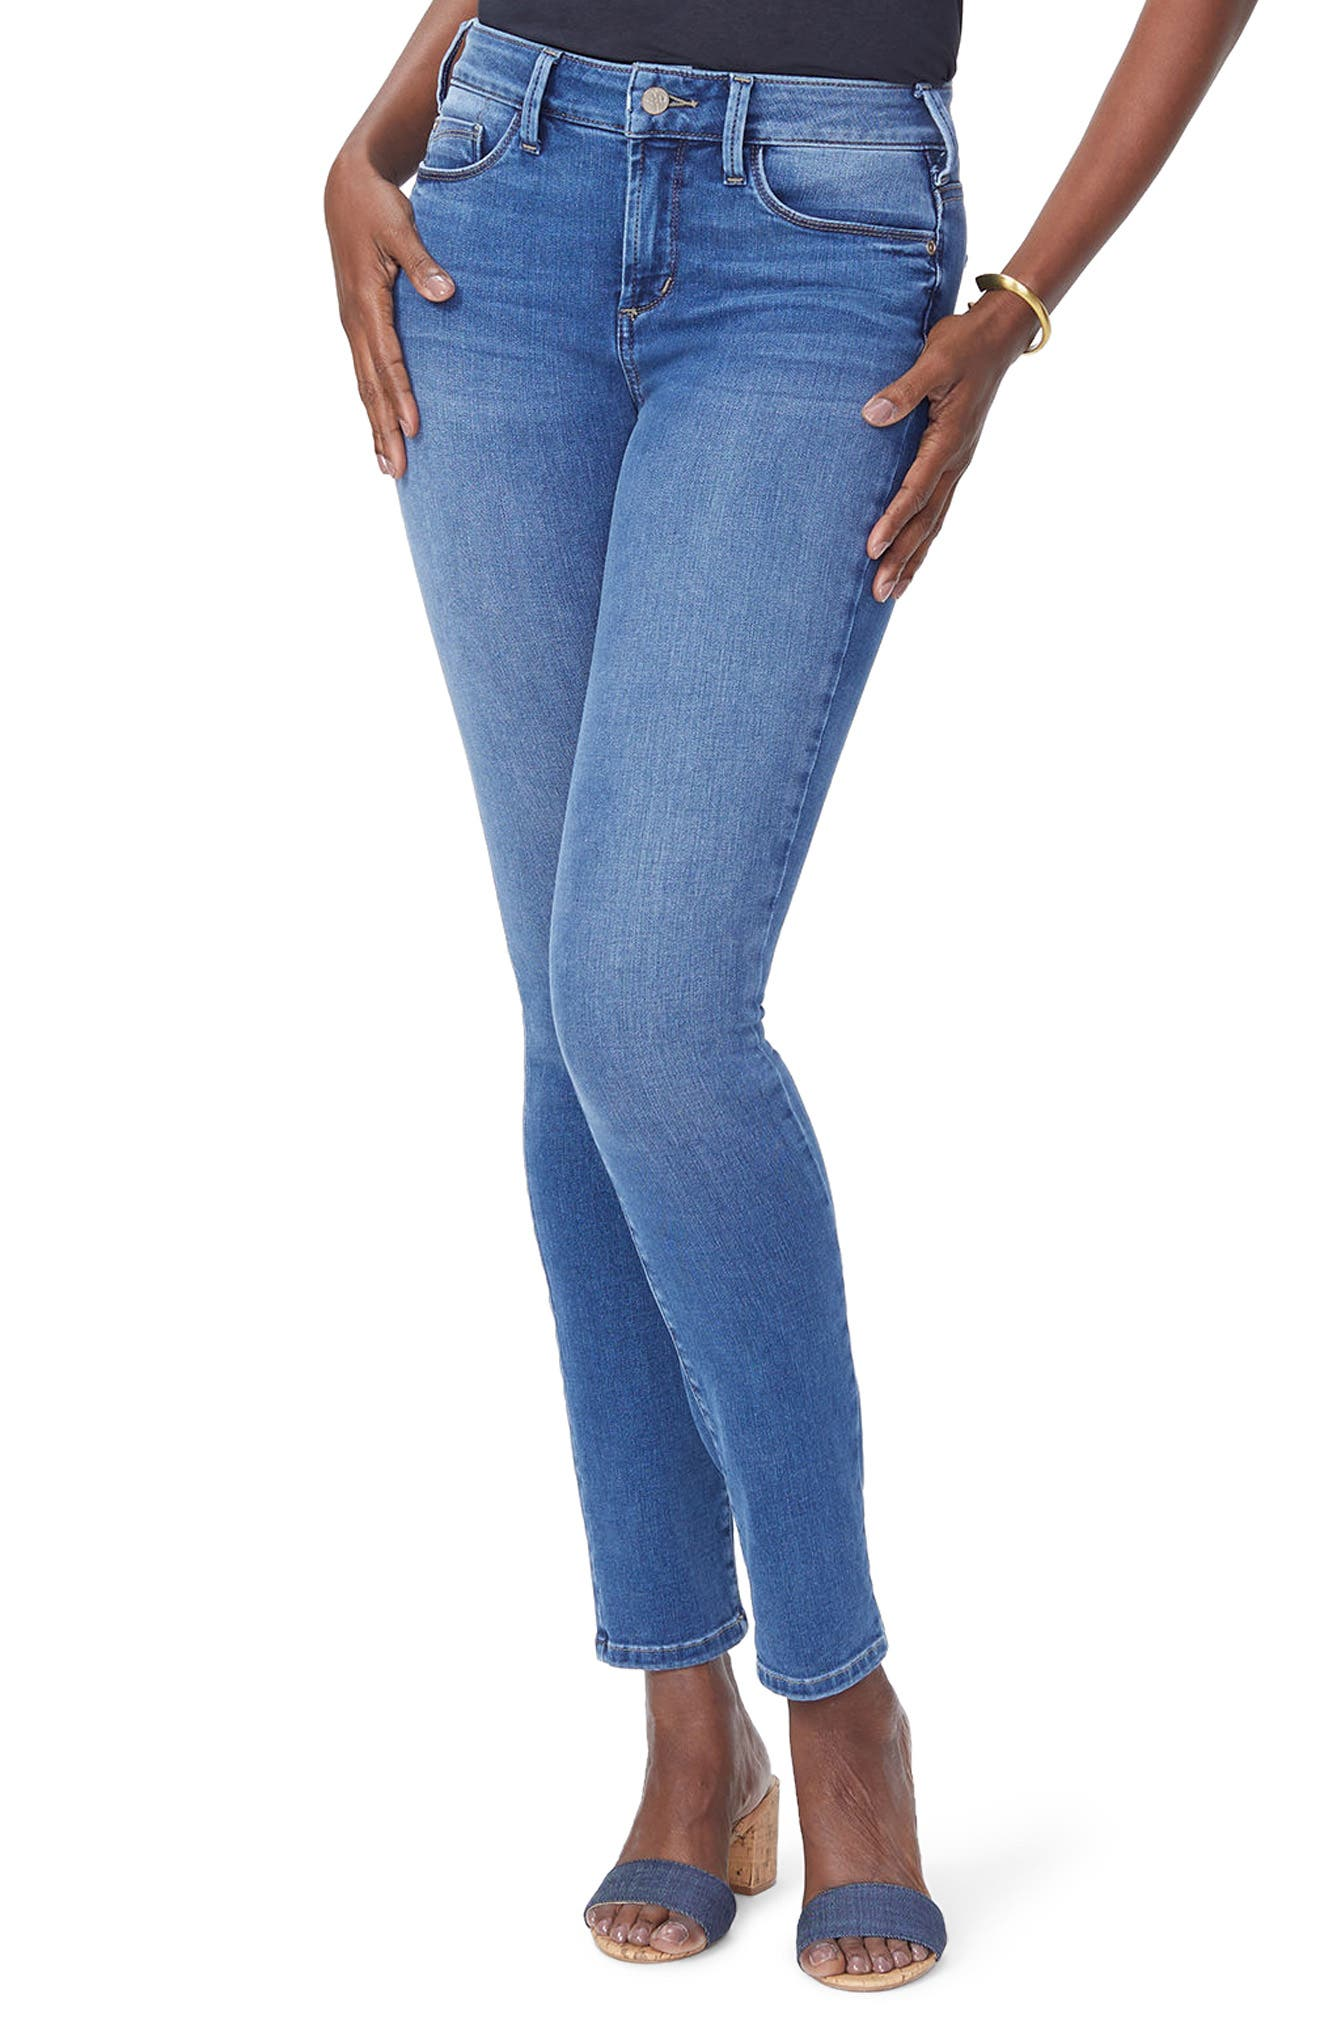 Alina Uplift Skinny Jeans,                         Main,                         color, Oasis